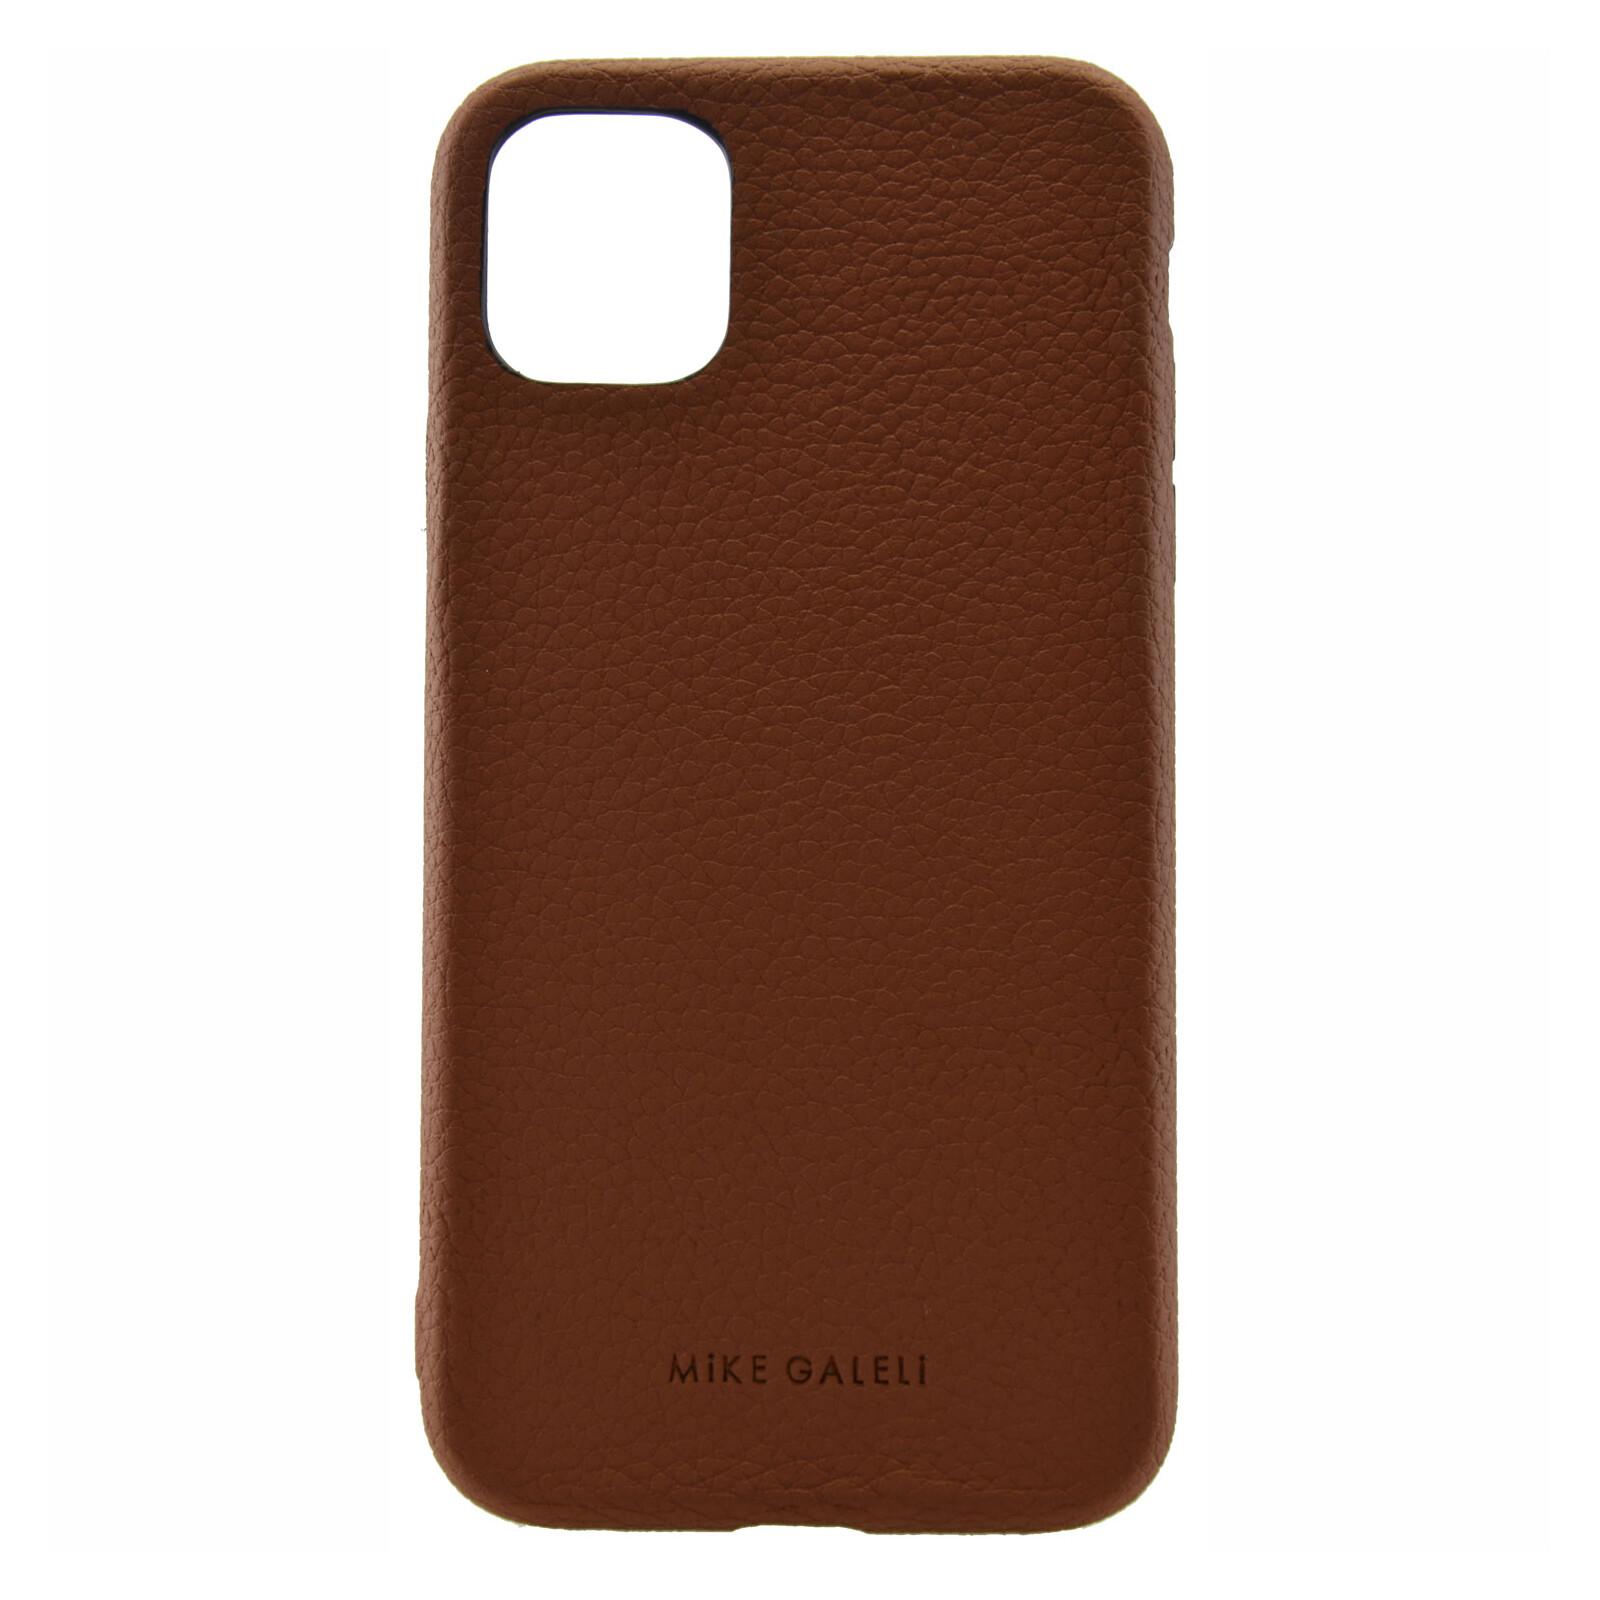 Galeli Backcover FINN Apple iPhone 12  Max/ Pro almond